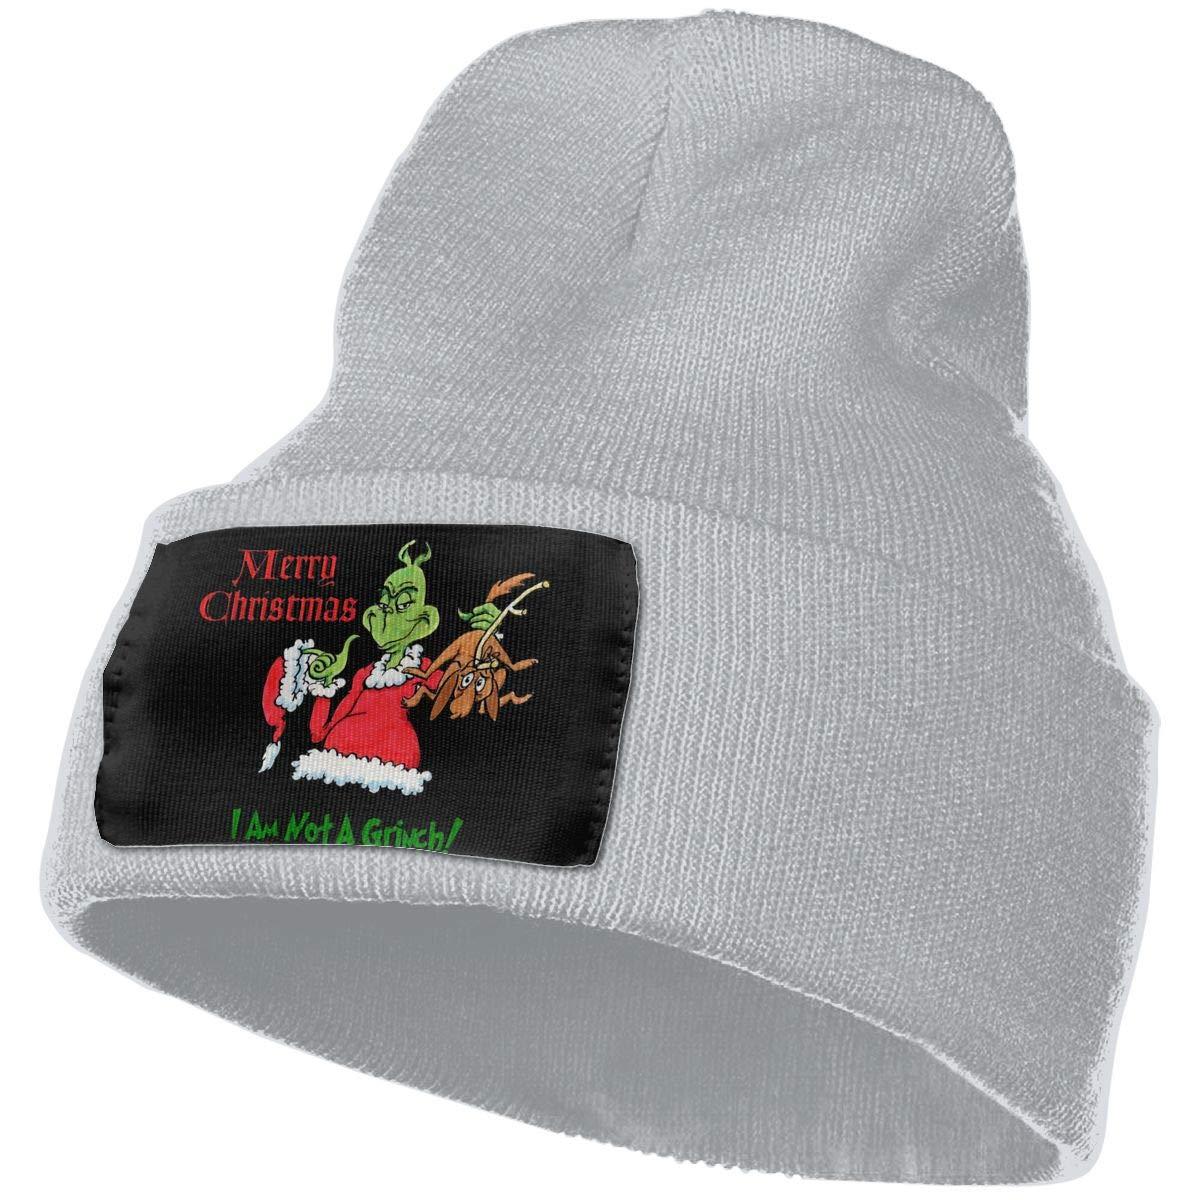 SLADDD1 Grinch Stole Christmas Warm Winter Hat Knit Beanie Skull Cap Cuff Beanie Hat Winter Hats for Men /& Women